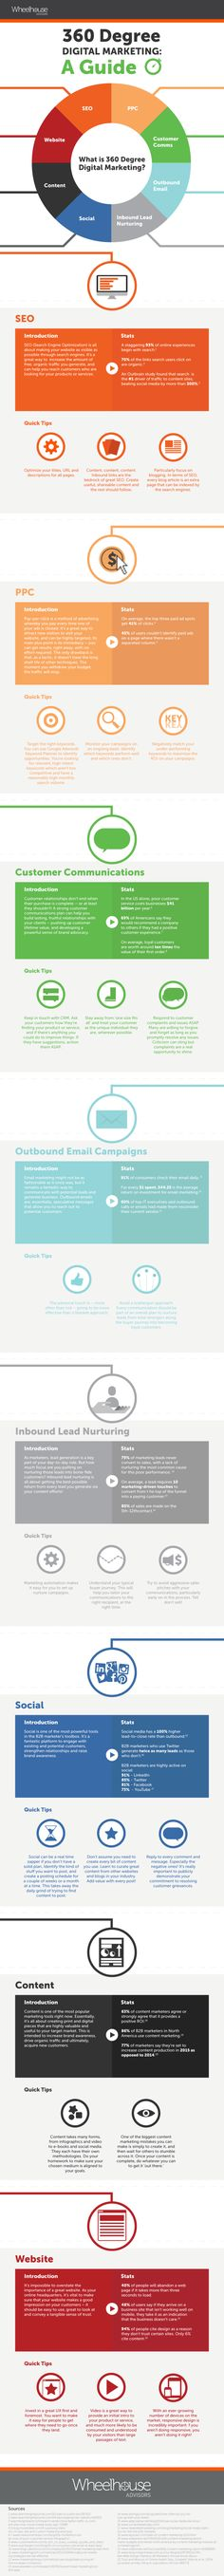 360 Degree Digital Marketing: A Guide [ | hanifsipai.com